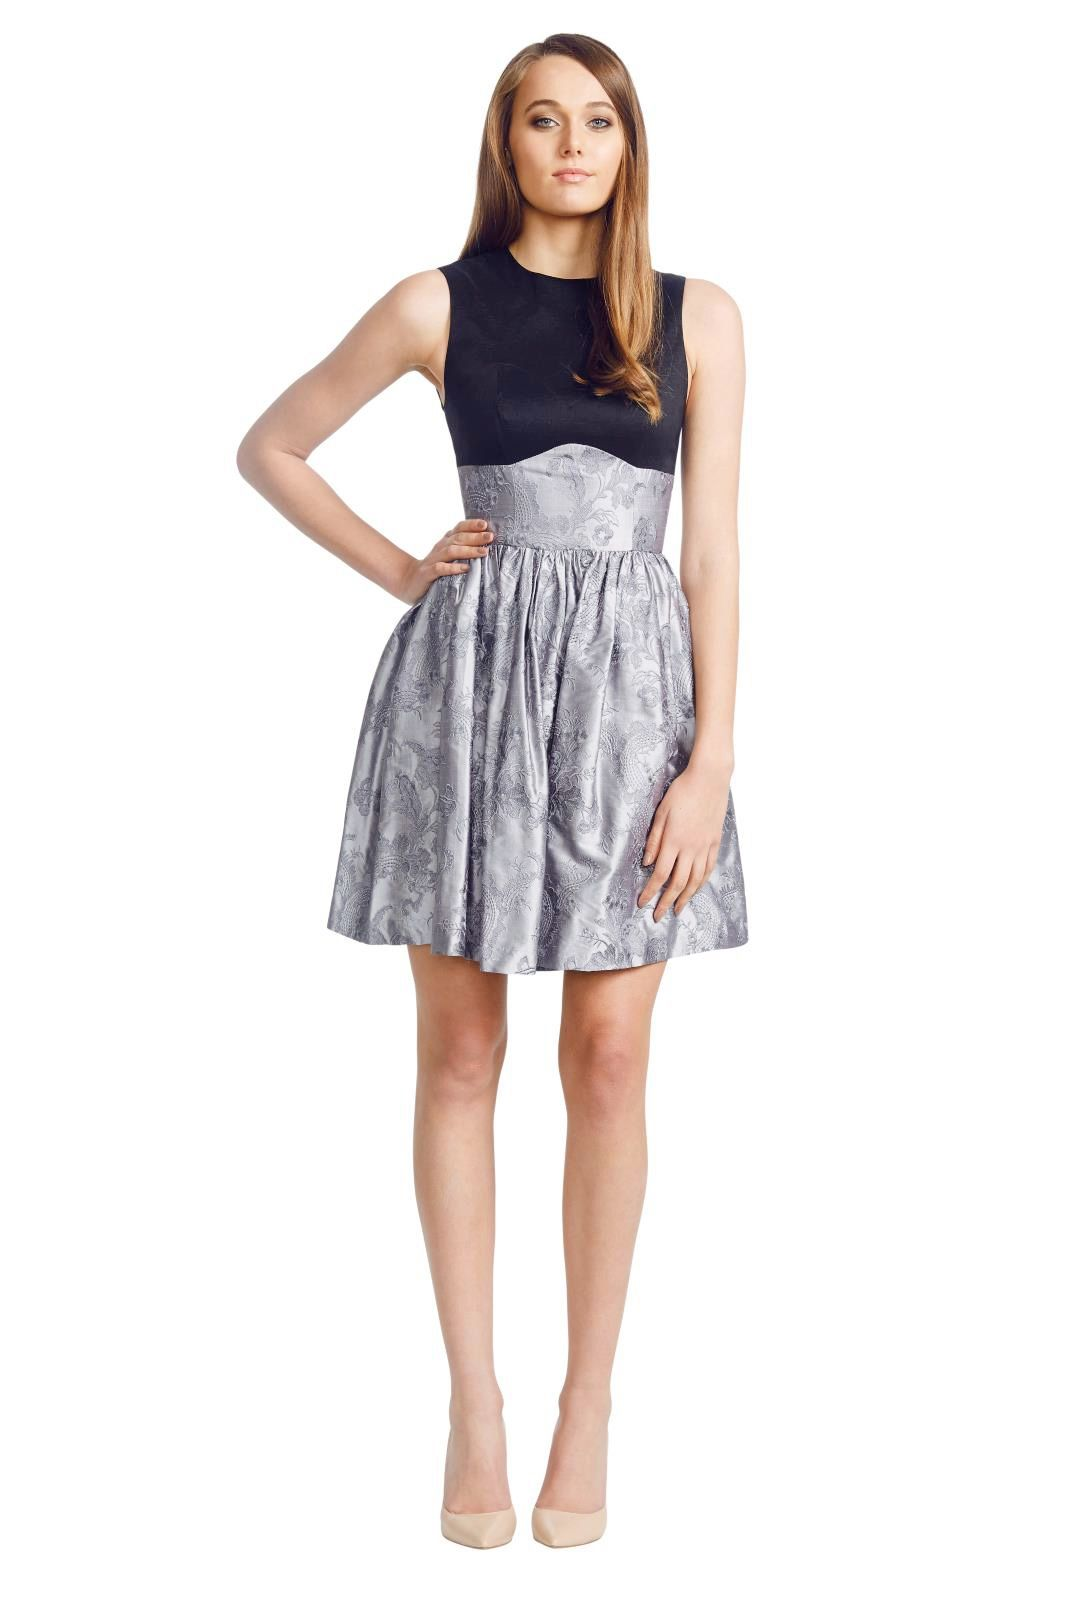 Jayson Brunsdon - Pompadour Dress - Black - Front